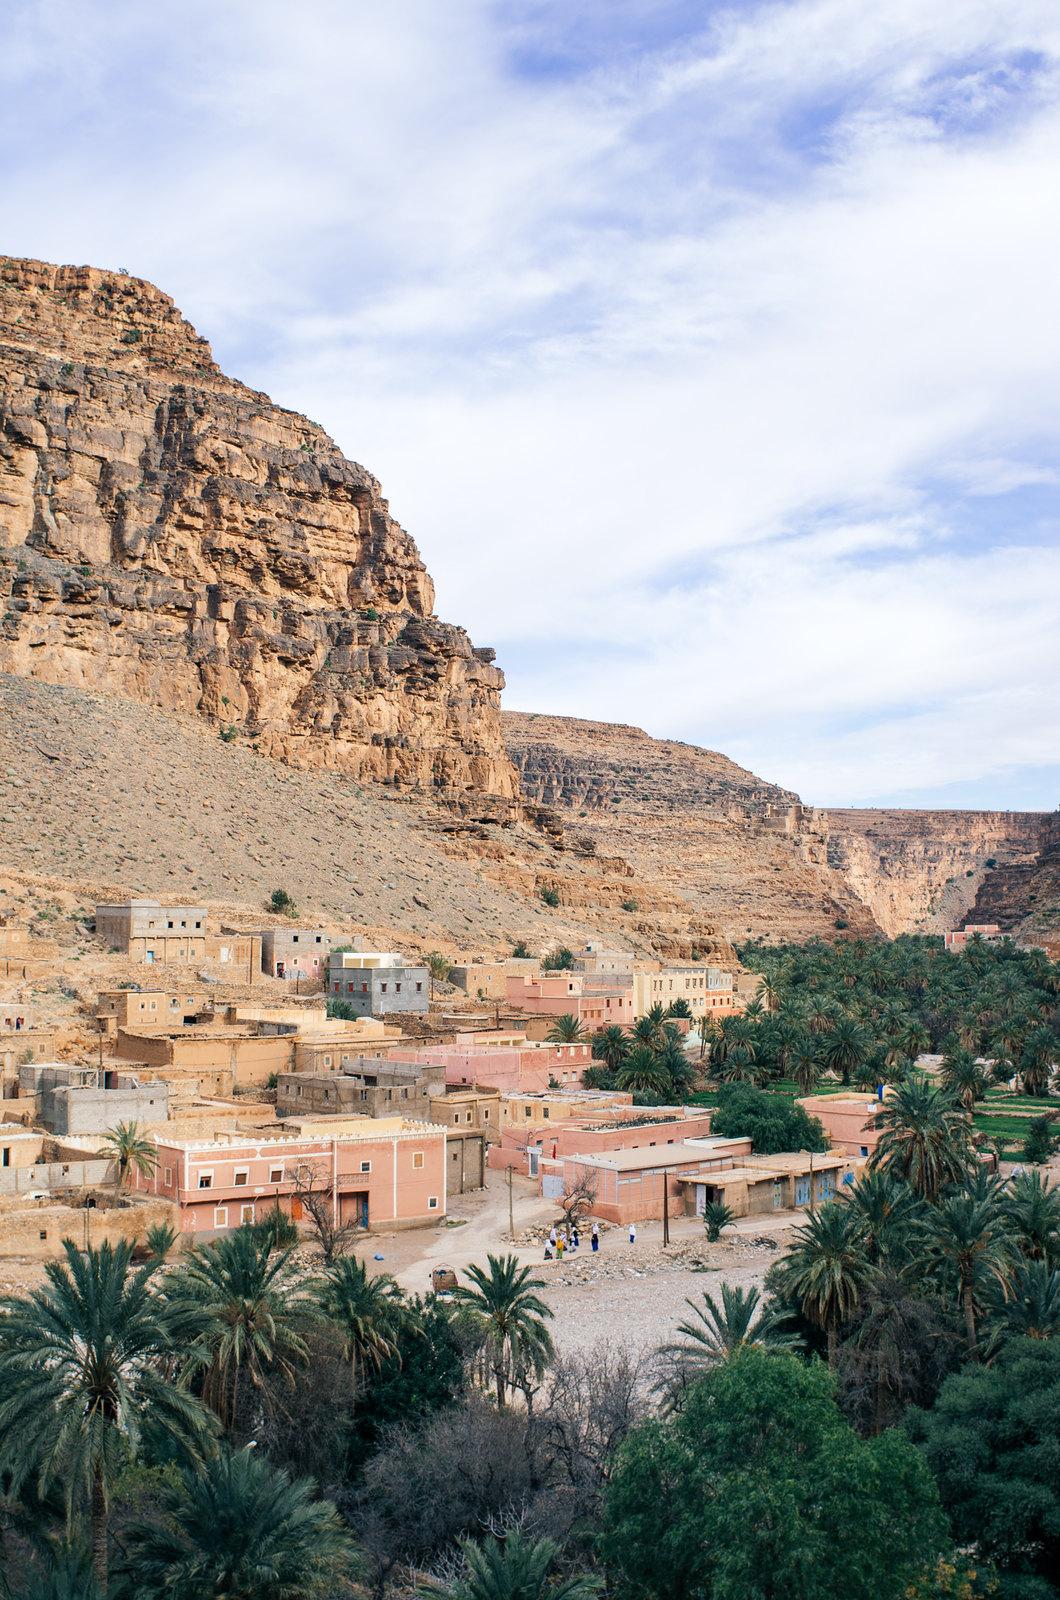 Amtoudi, anti-Atlas - 5 jours de trek au Maroc - L'oasis d'Id-Aïssa